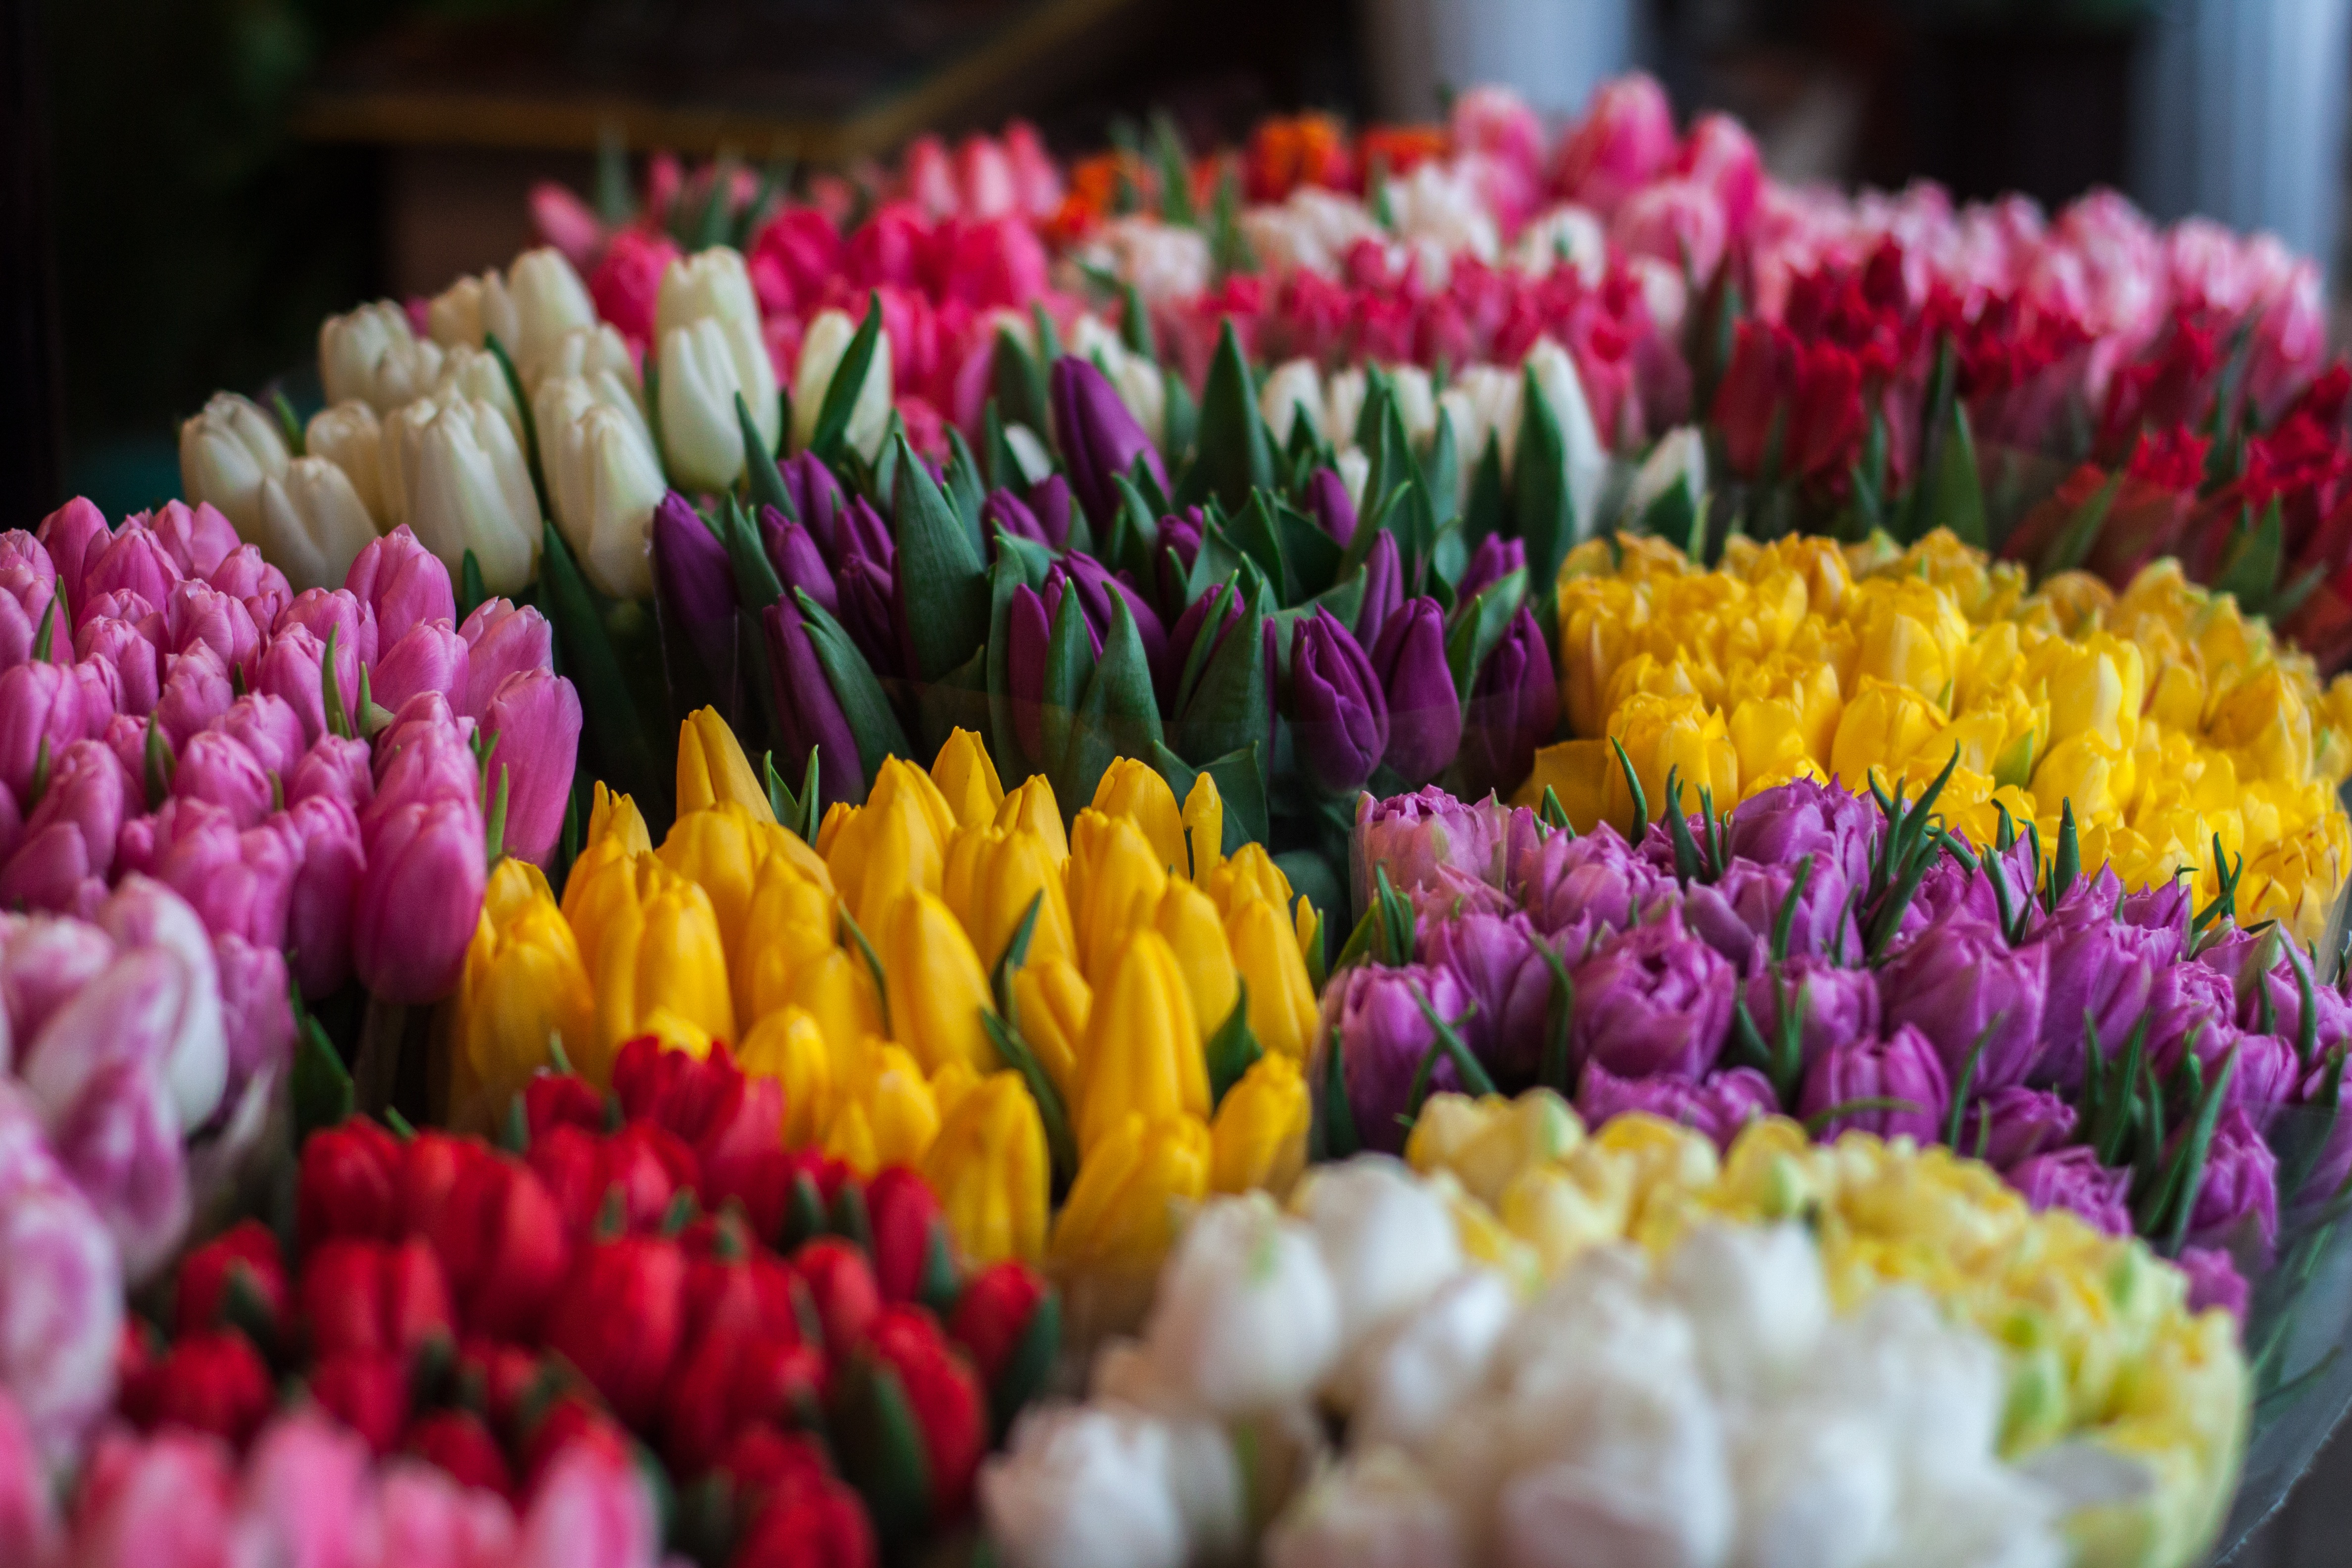 easter flowers, StockSnap_RIK0OYXSWU.jpg